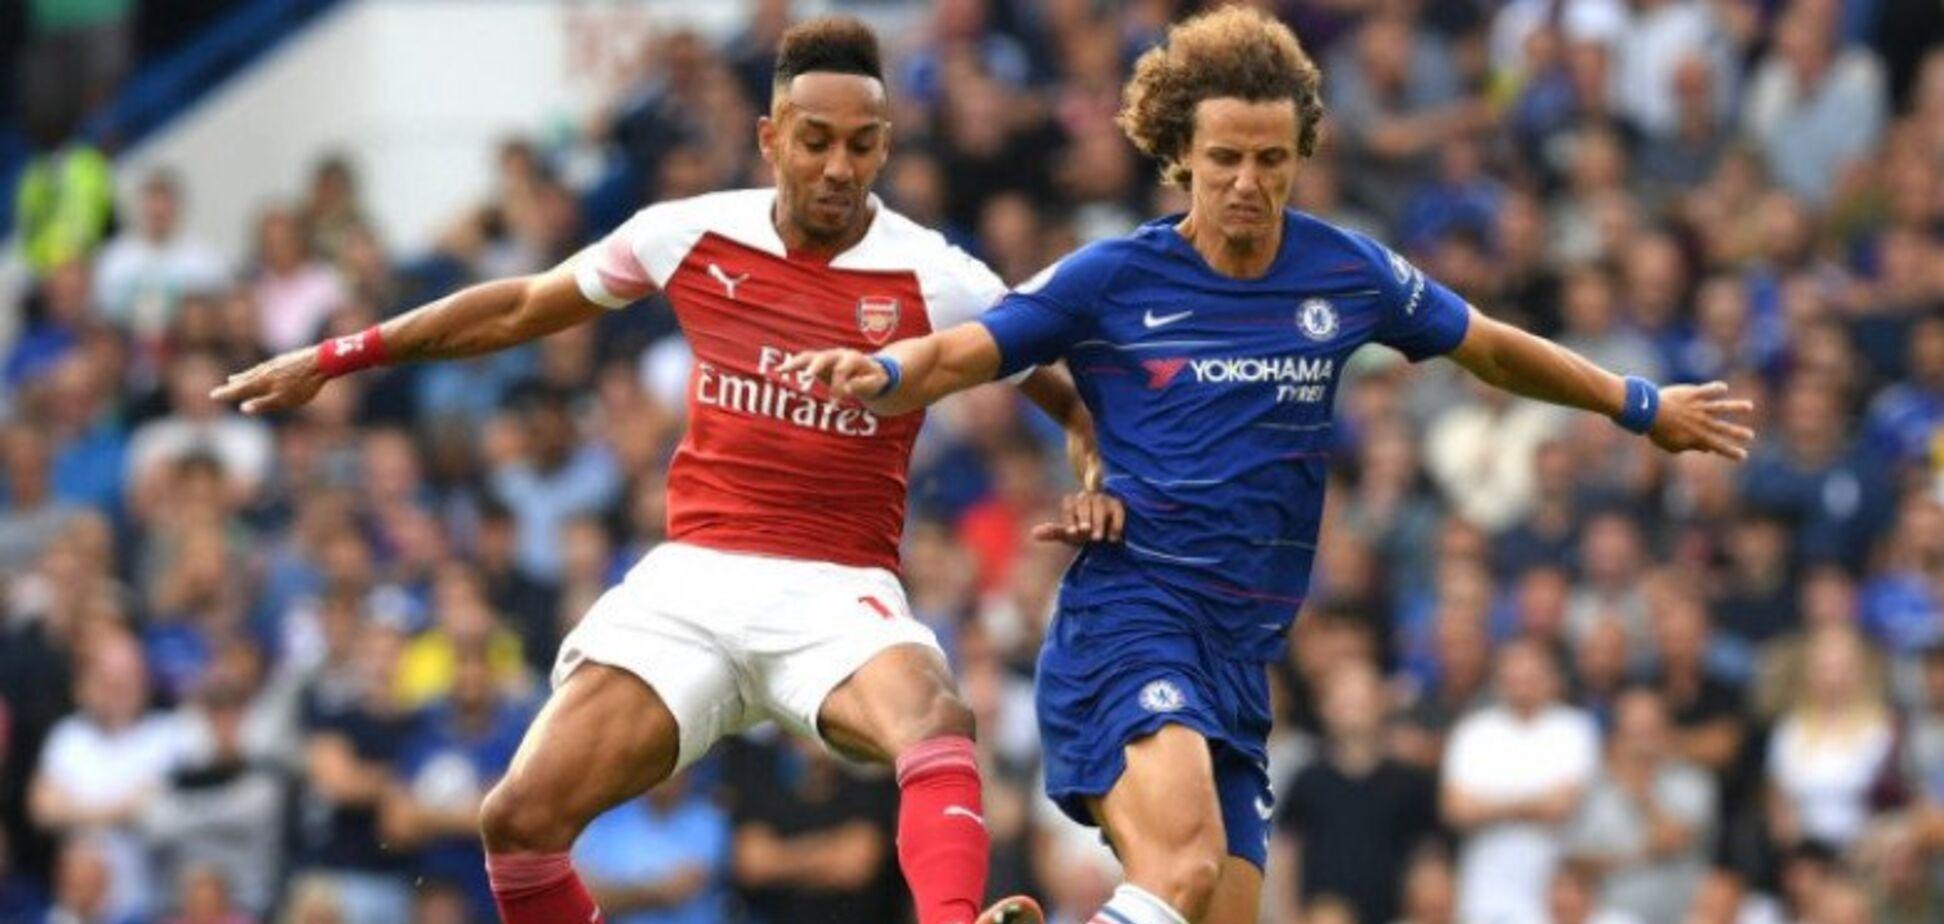 Финал Лиги Европы: Арсенал жестко наехал на УЕФА